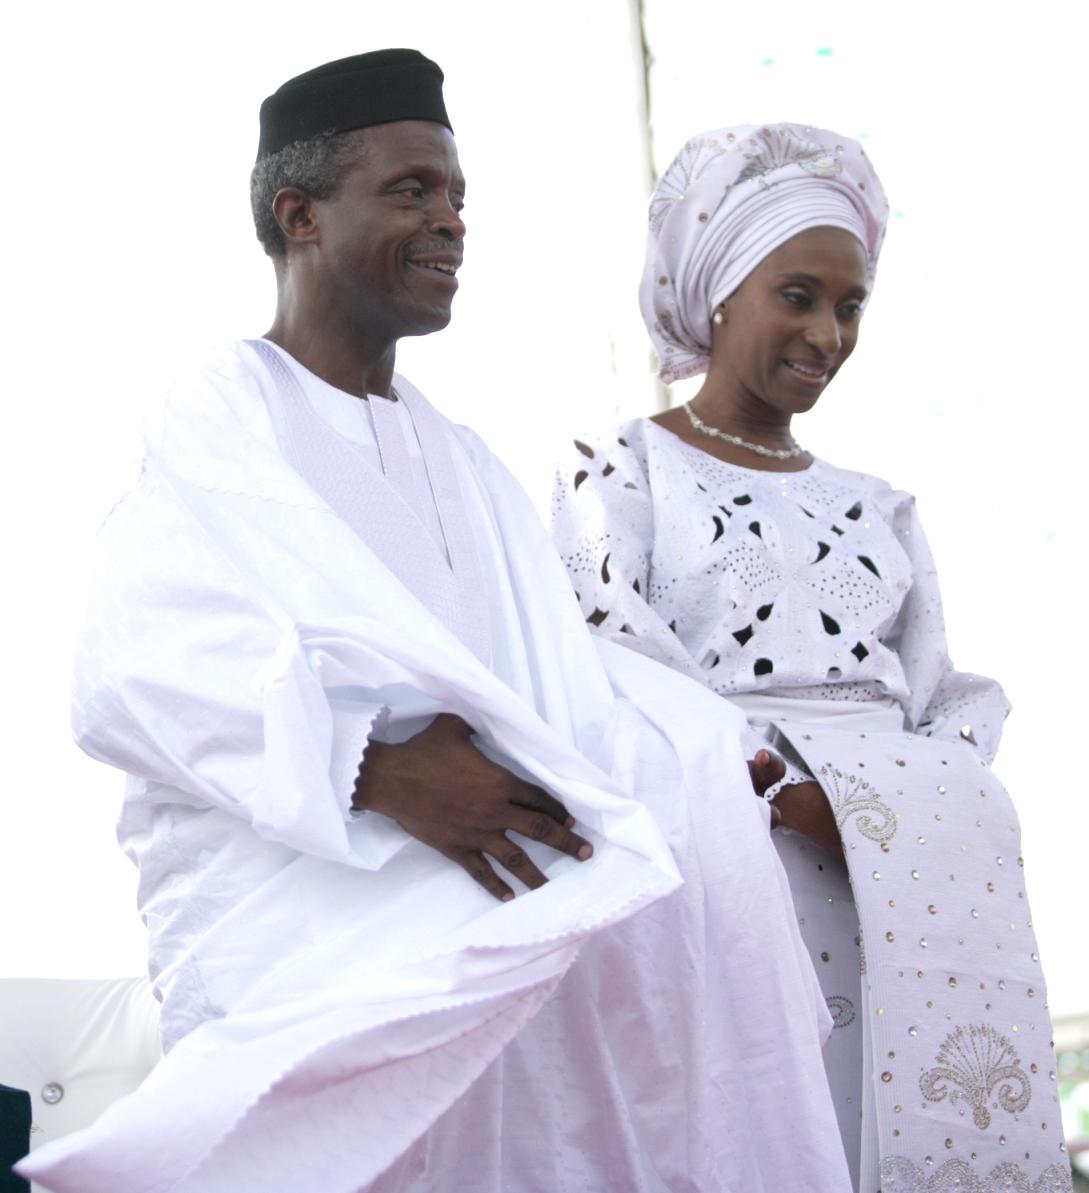 GOODLUCK, OSINBAJO AND WIFE